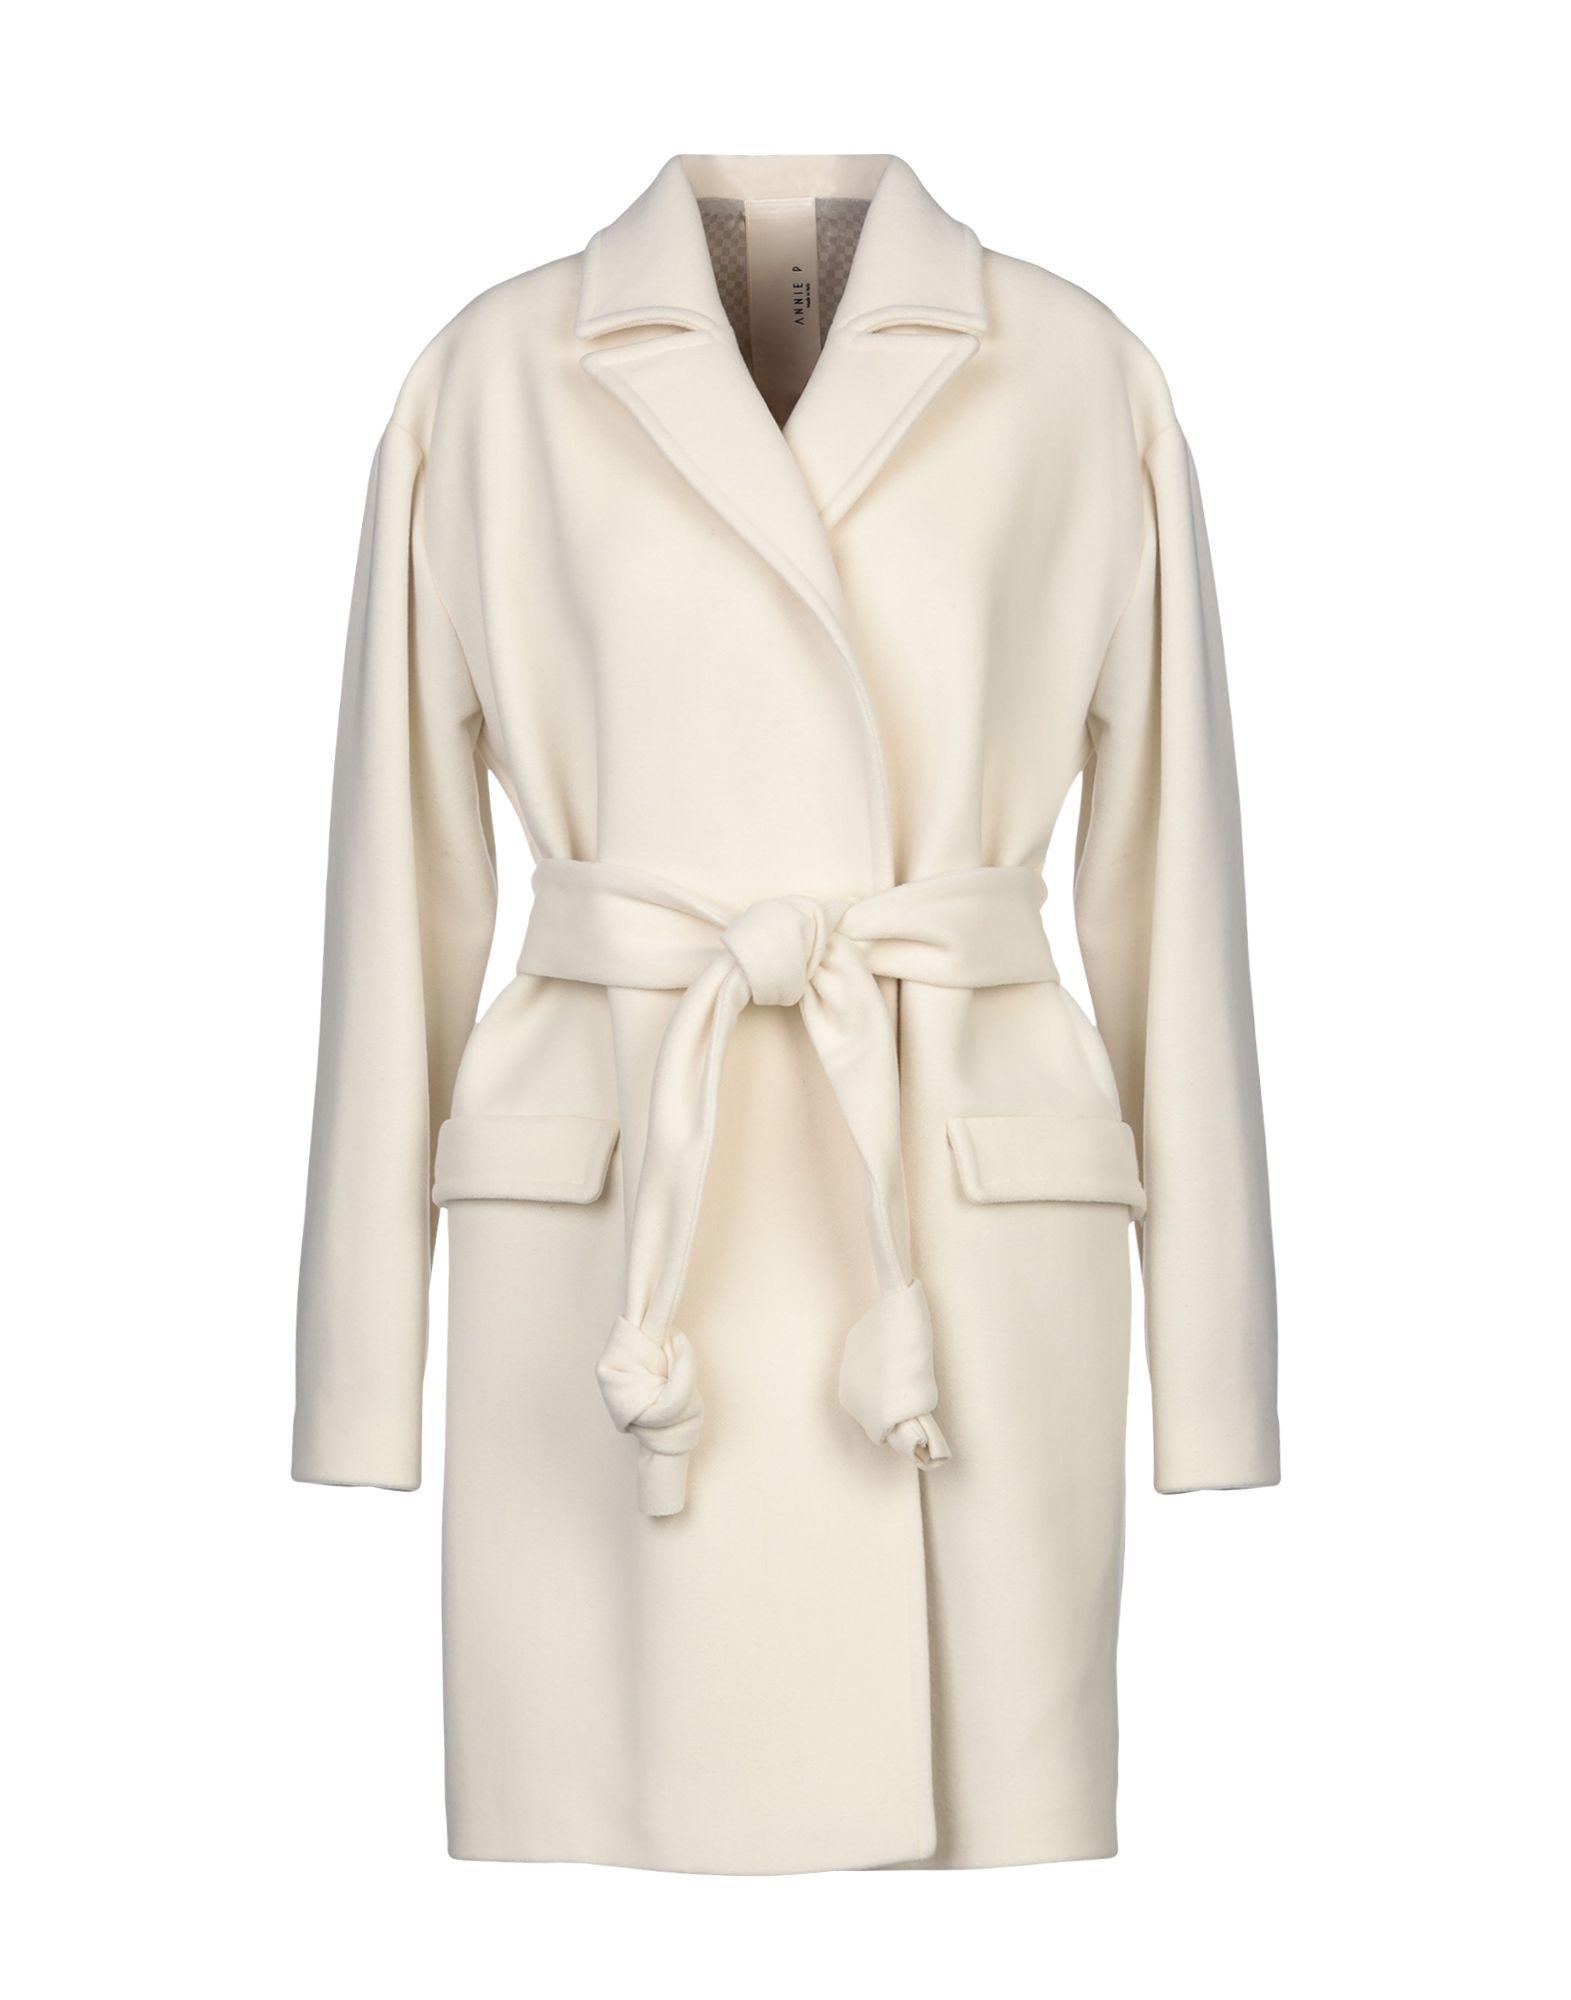 Coat & Jackets Annie P. Ivory Women's Virgin Wool